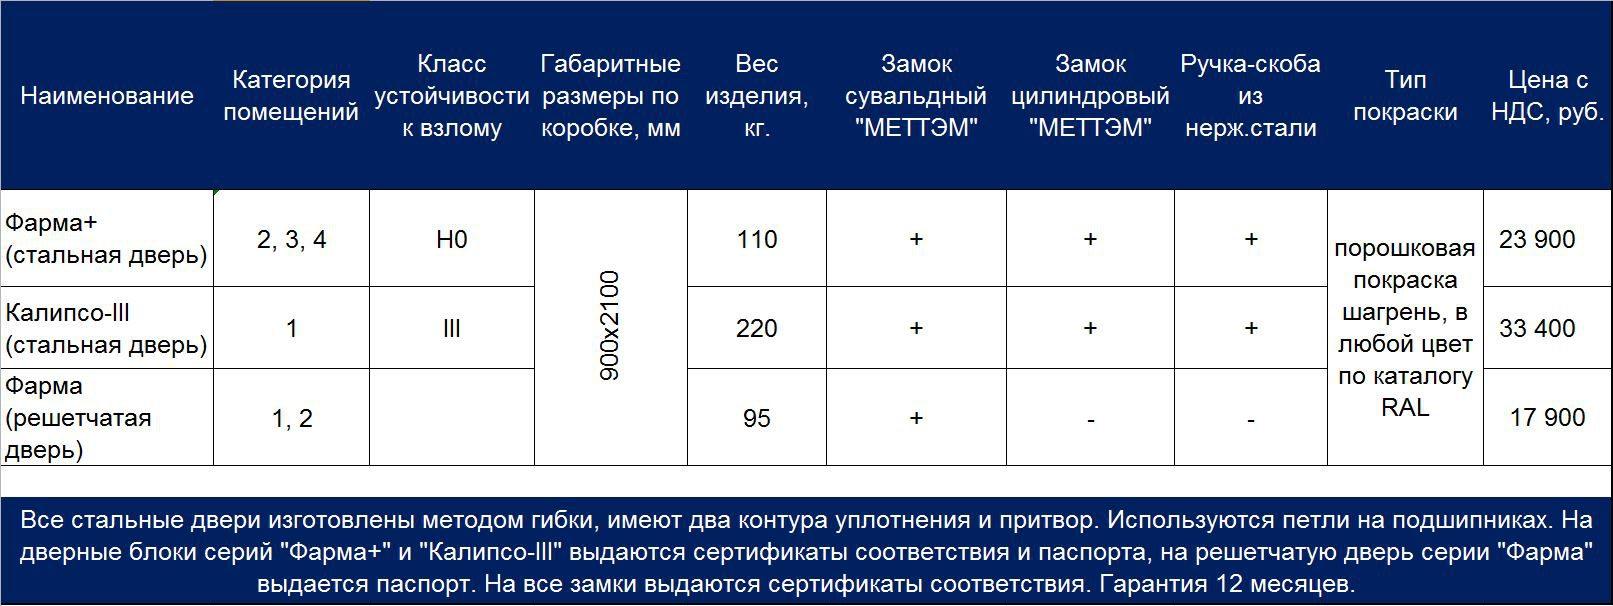 Прайс лист двери КХН МТМ-ПРО май 2020